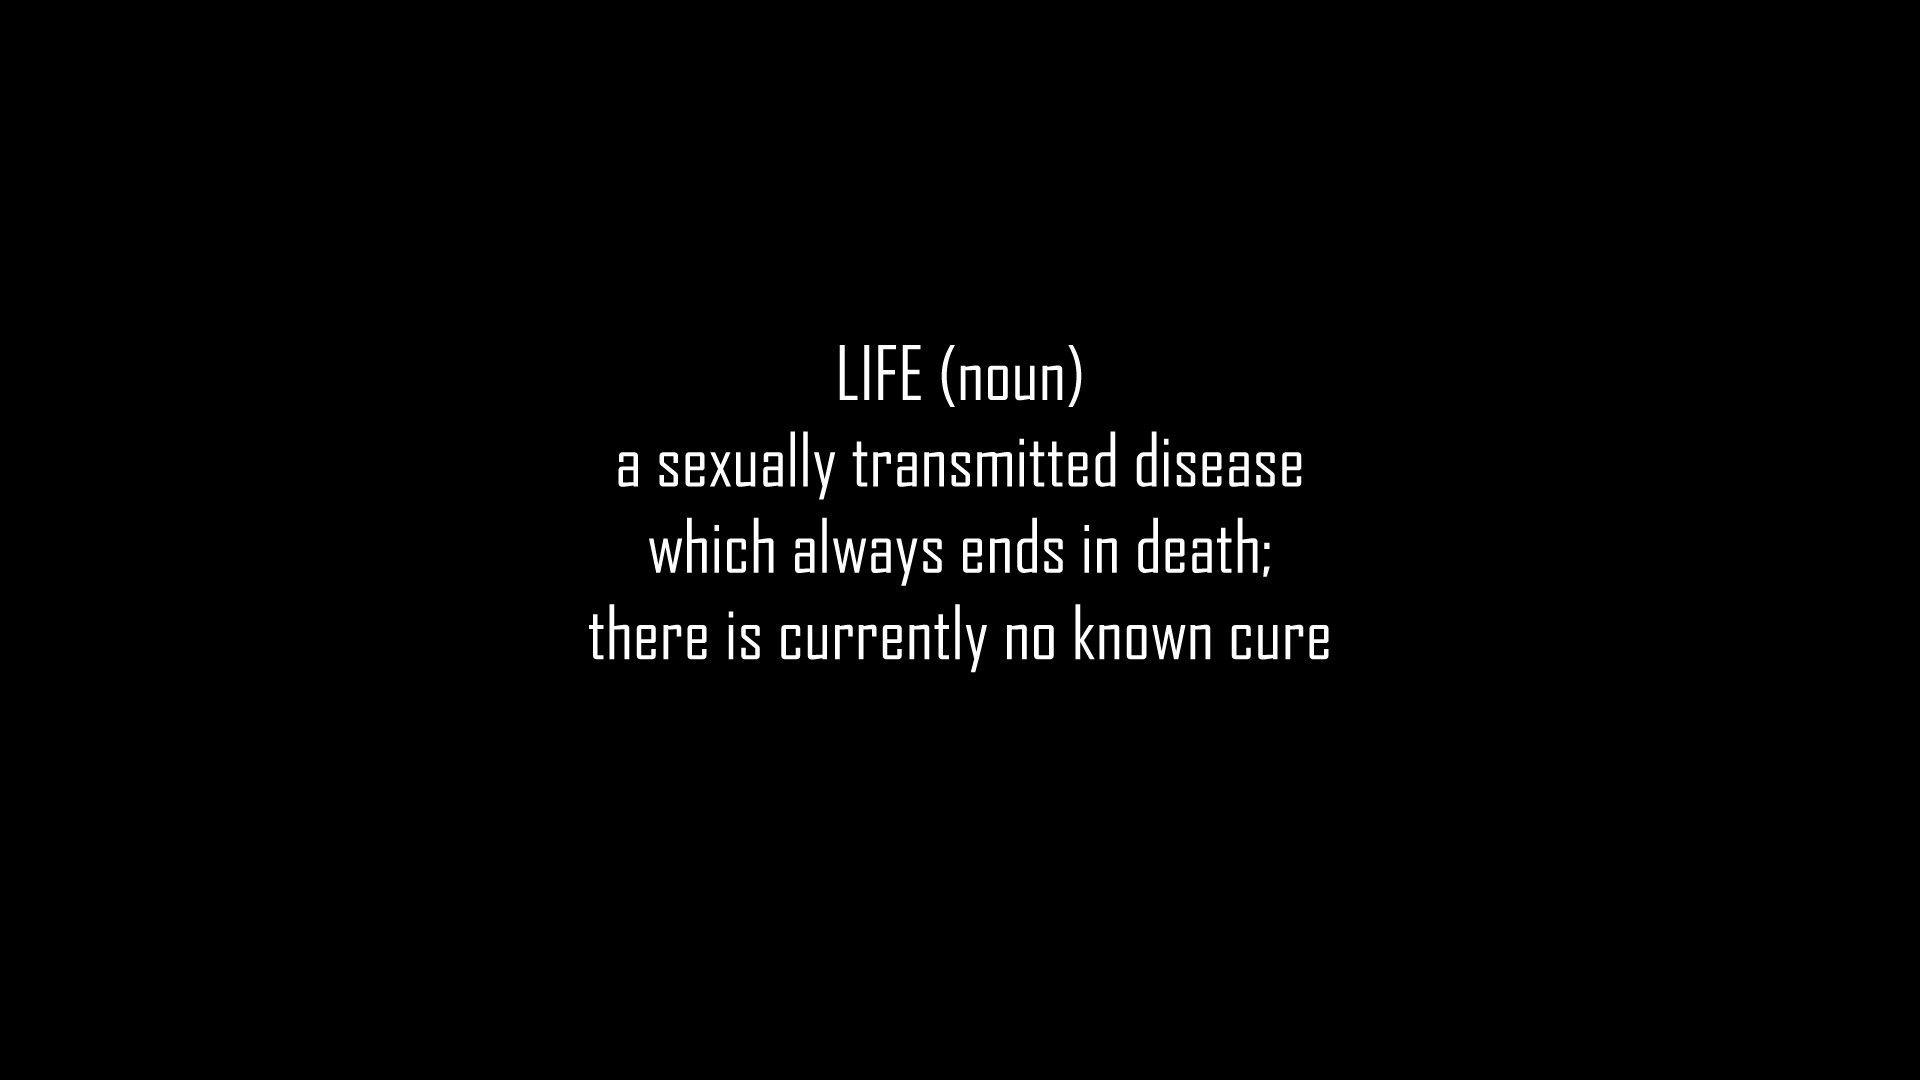 Quotes Words Minimalism Life Black Background